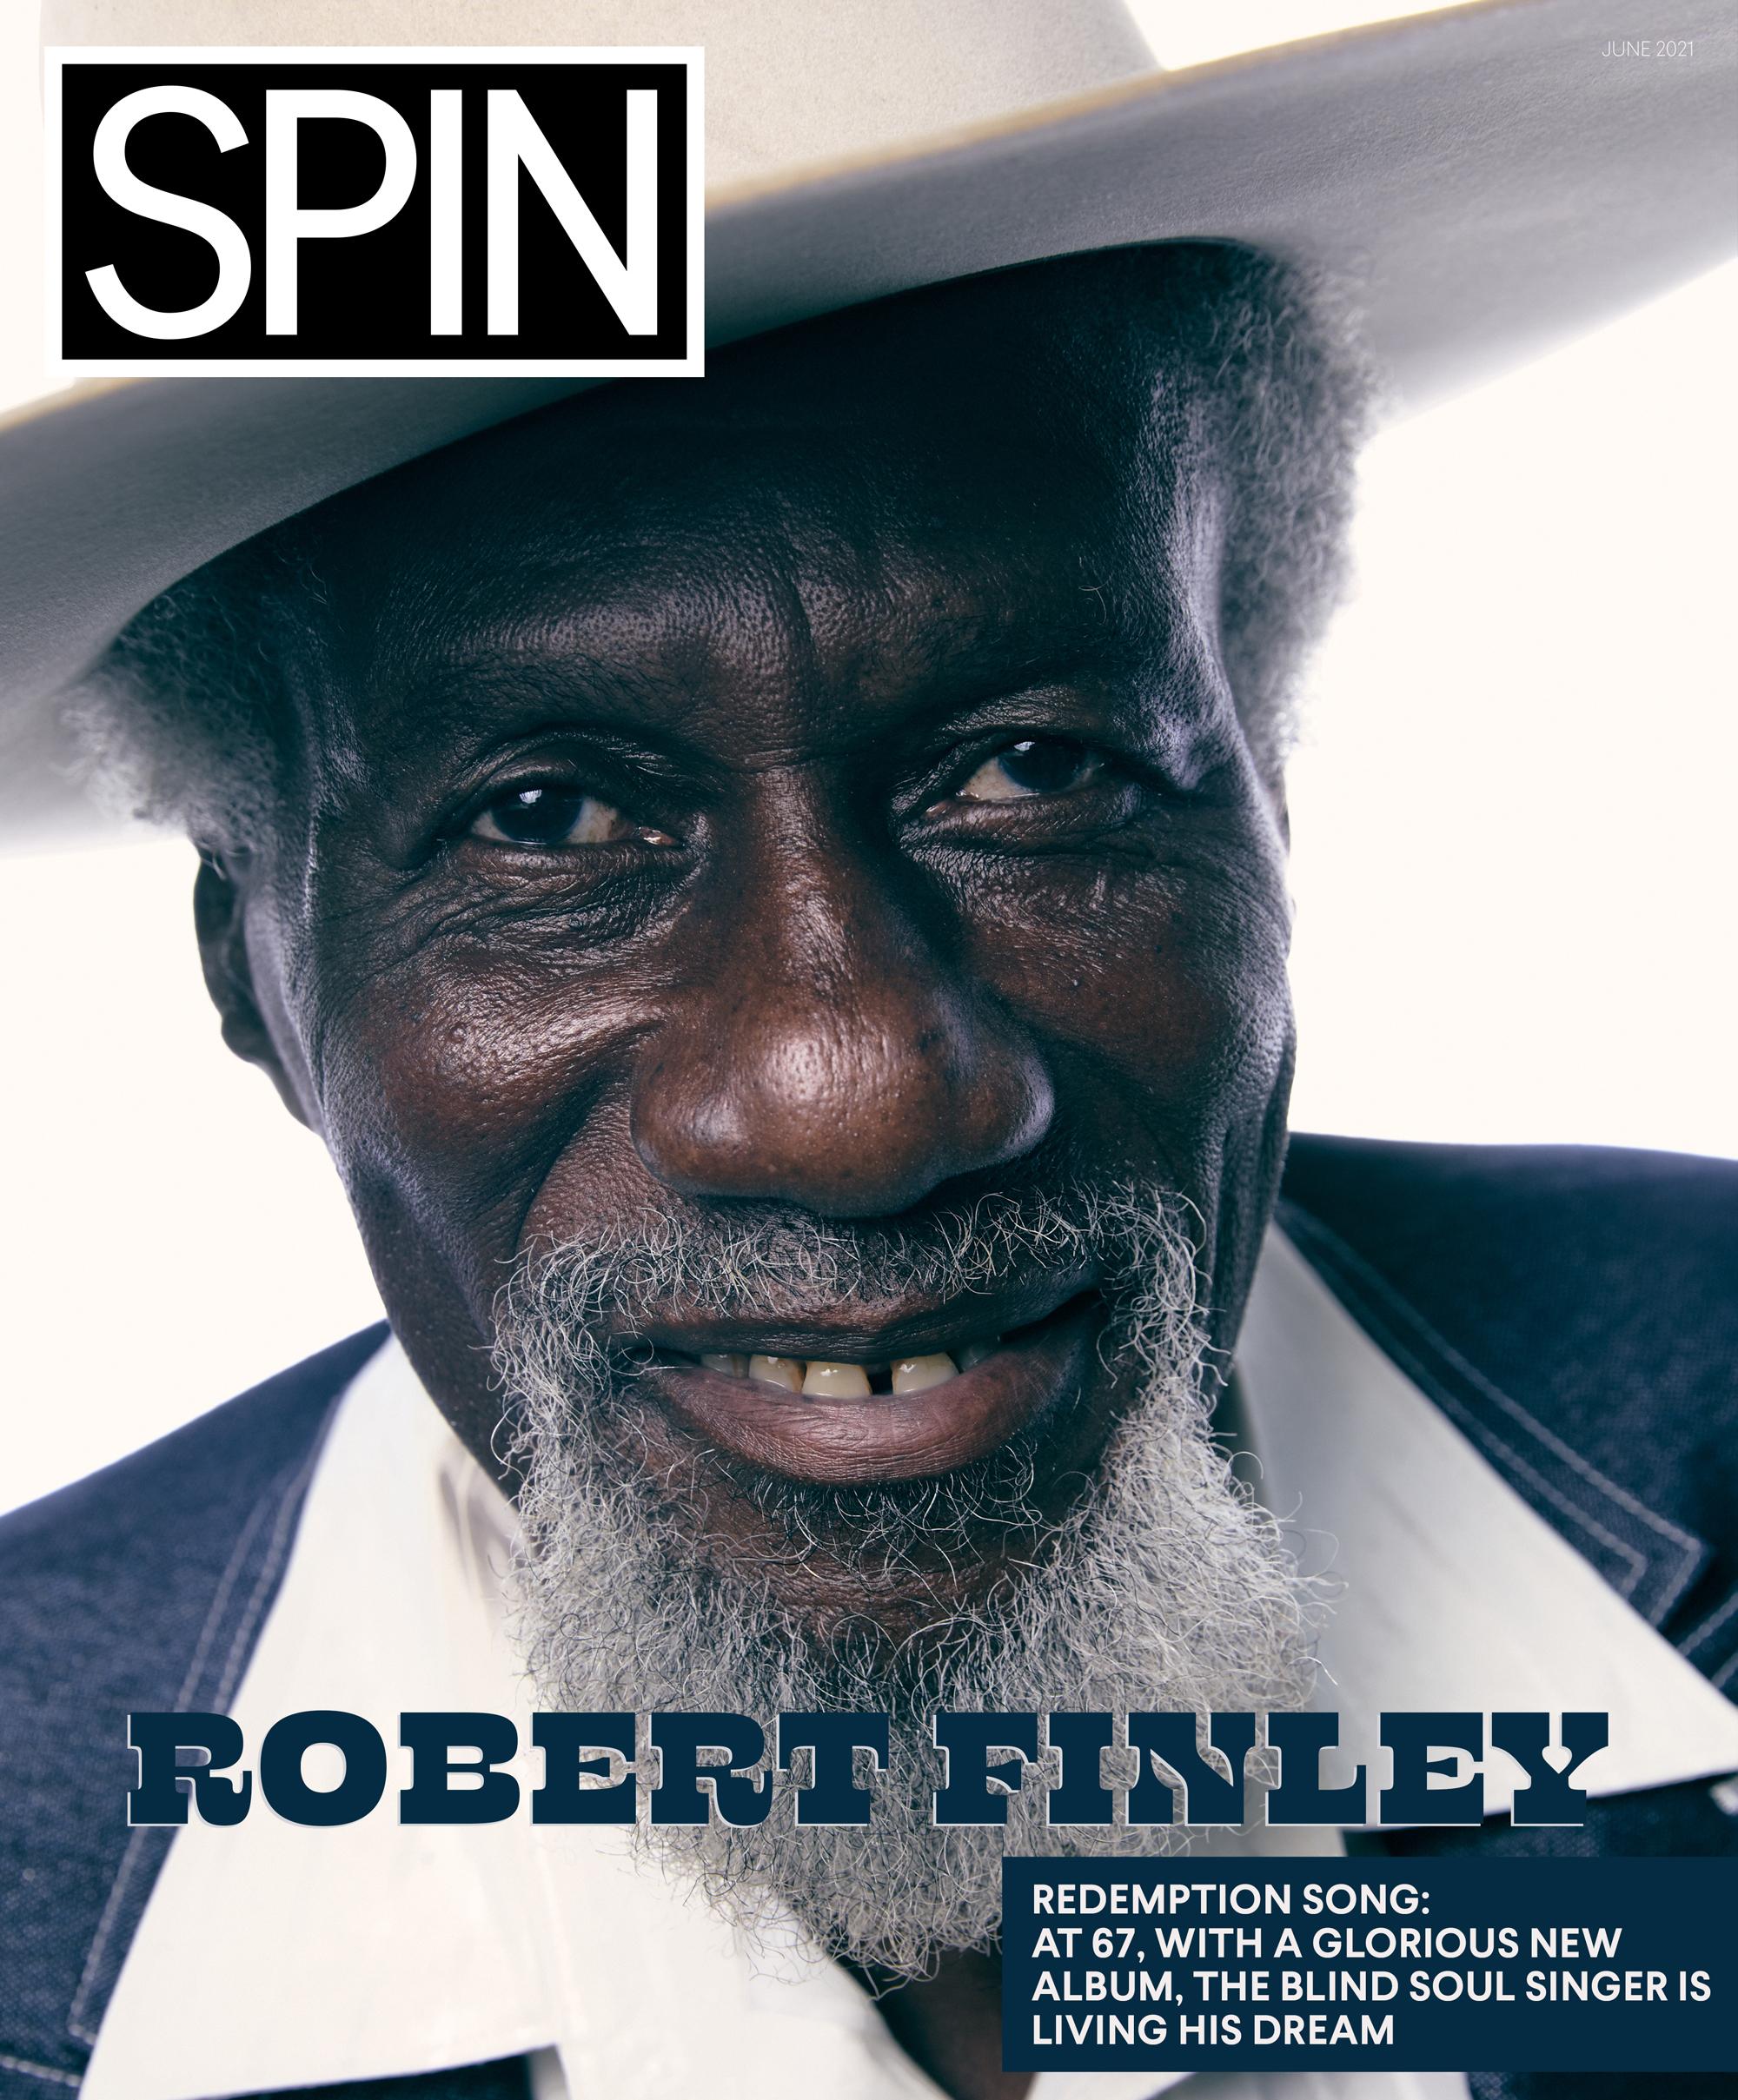 Robert Finley June 2021 cover